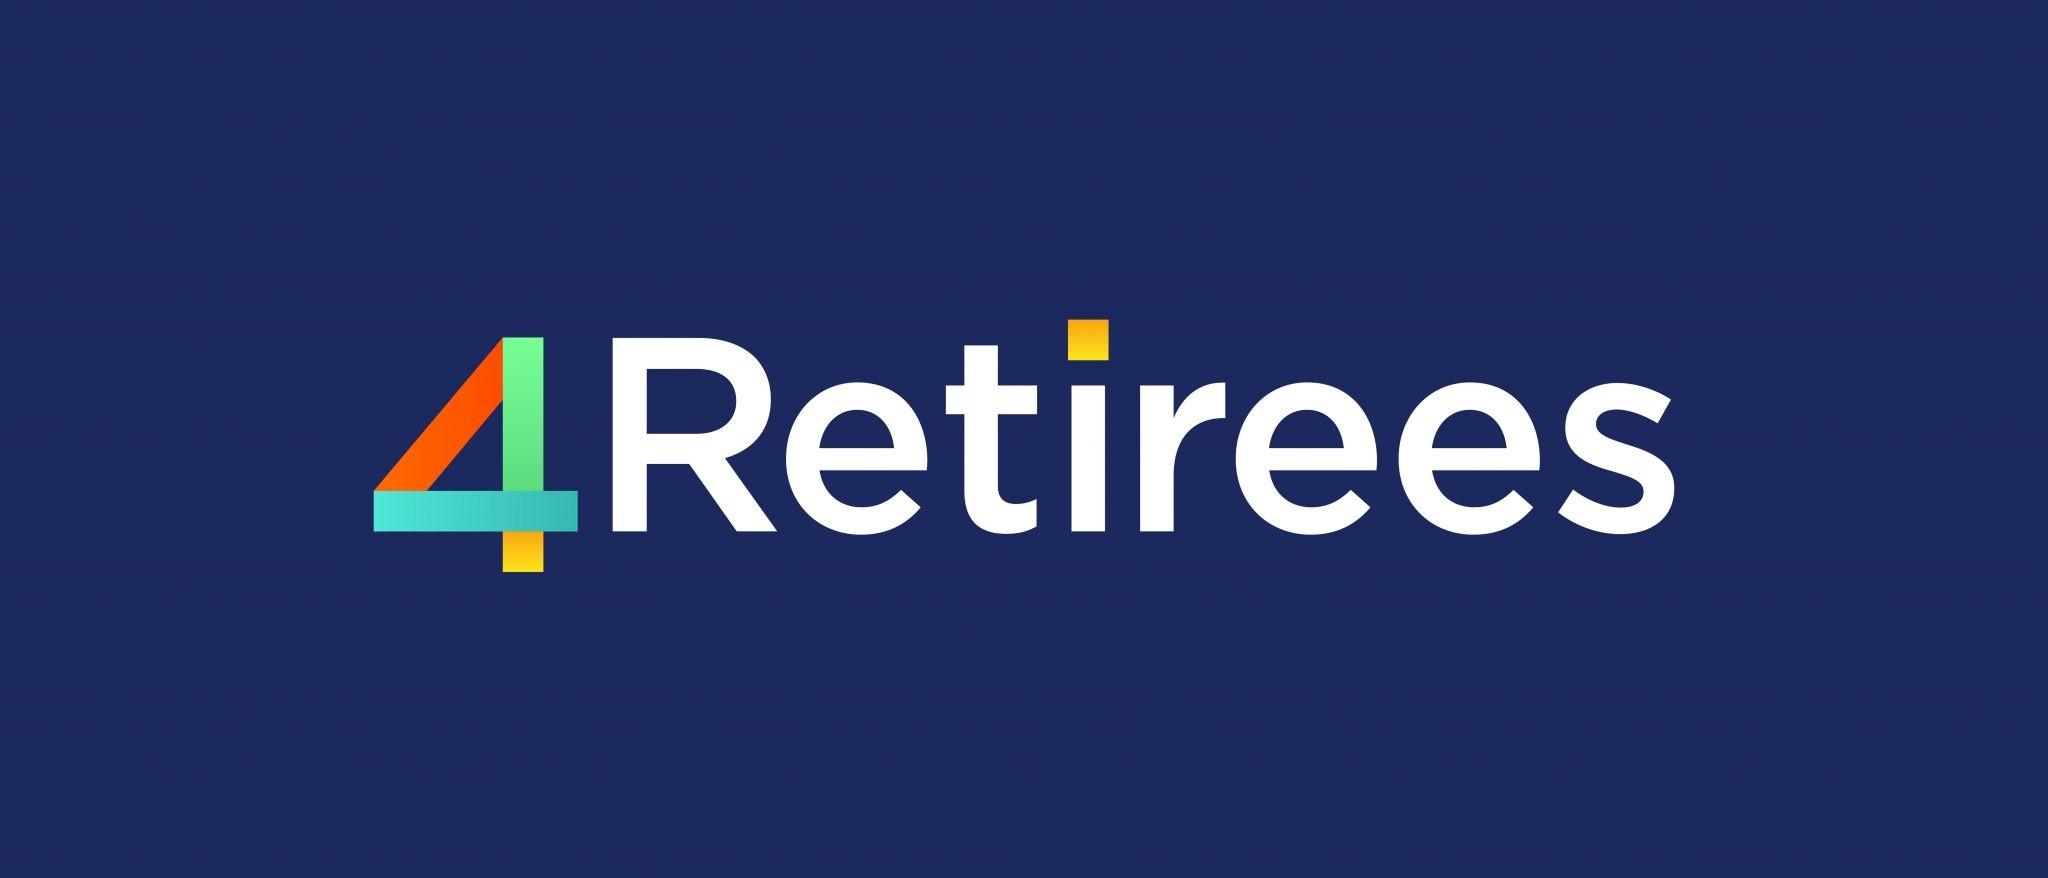 4Retirees Pty Ltd